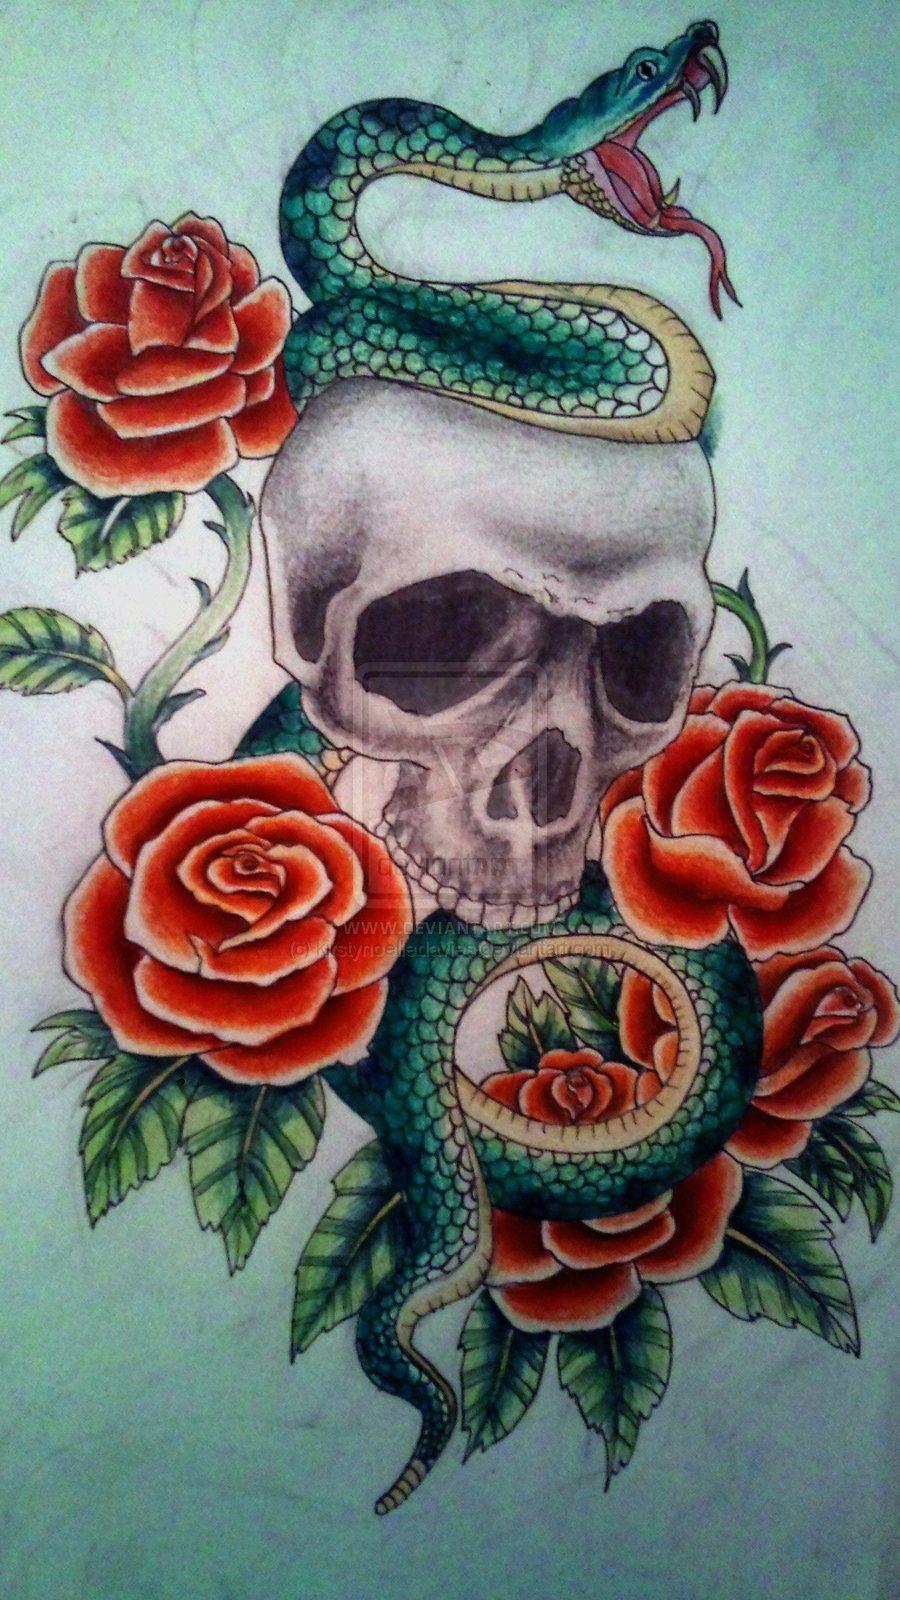 Snake Skull Tattoo: Skull And Snake Tattoo By Kirstynoelledavies.deviantart